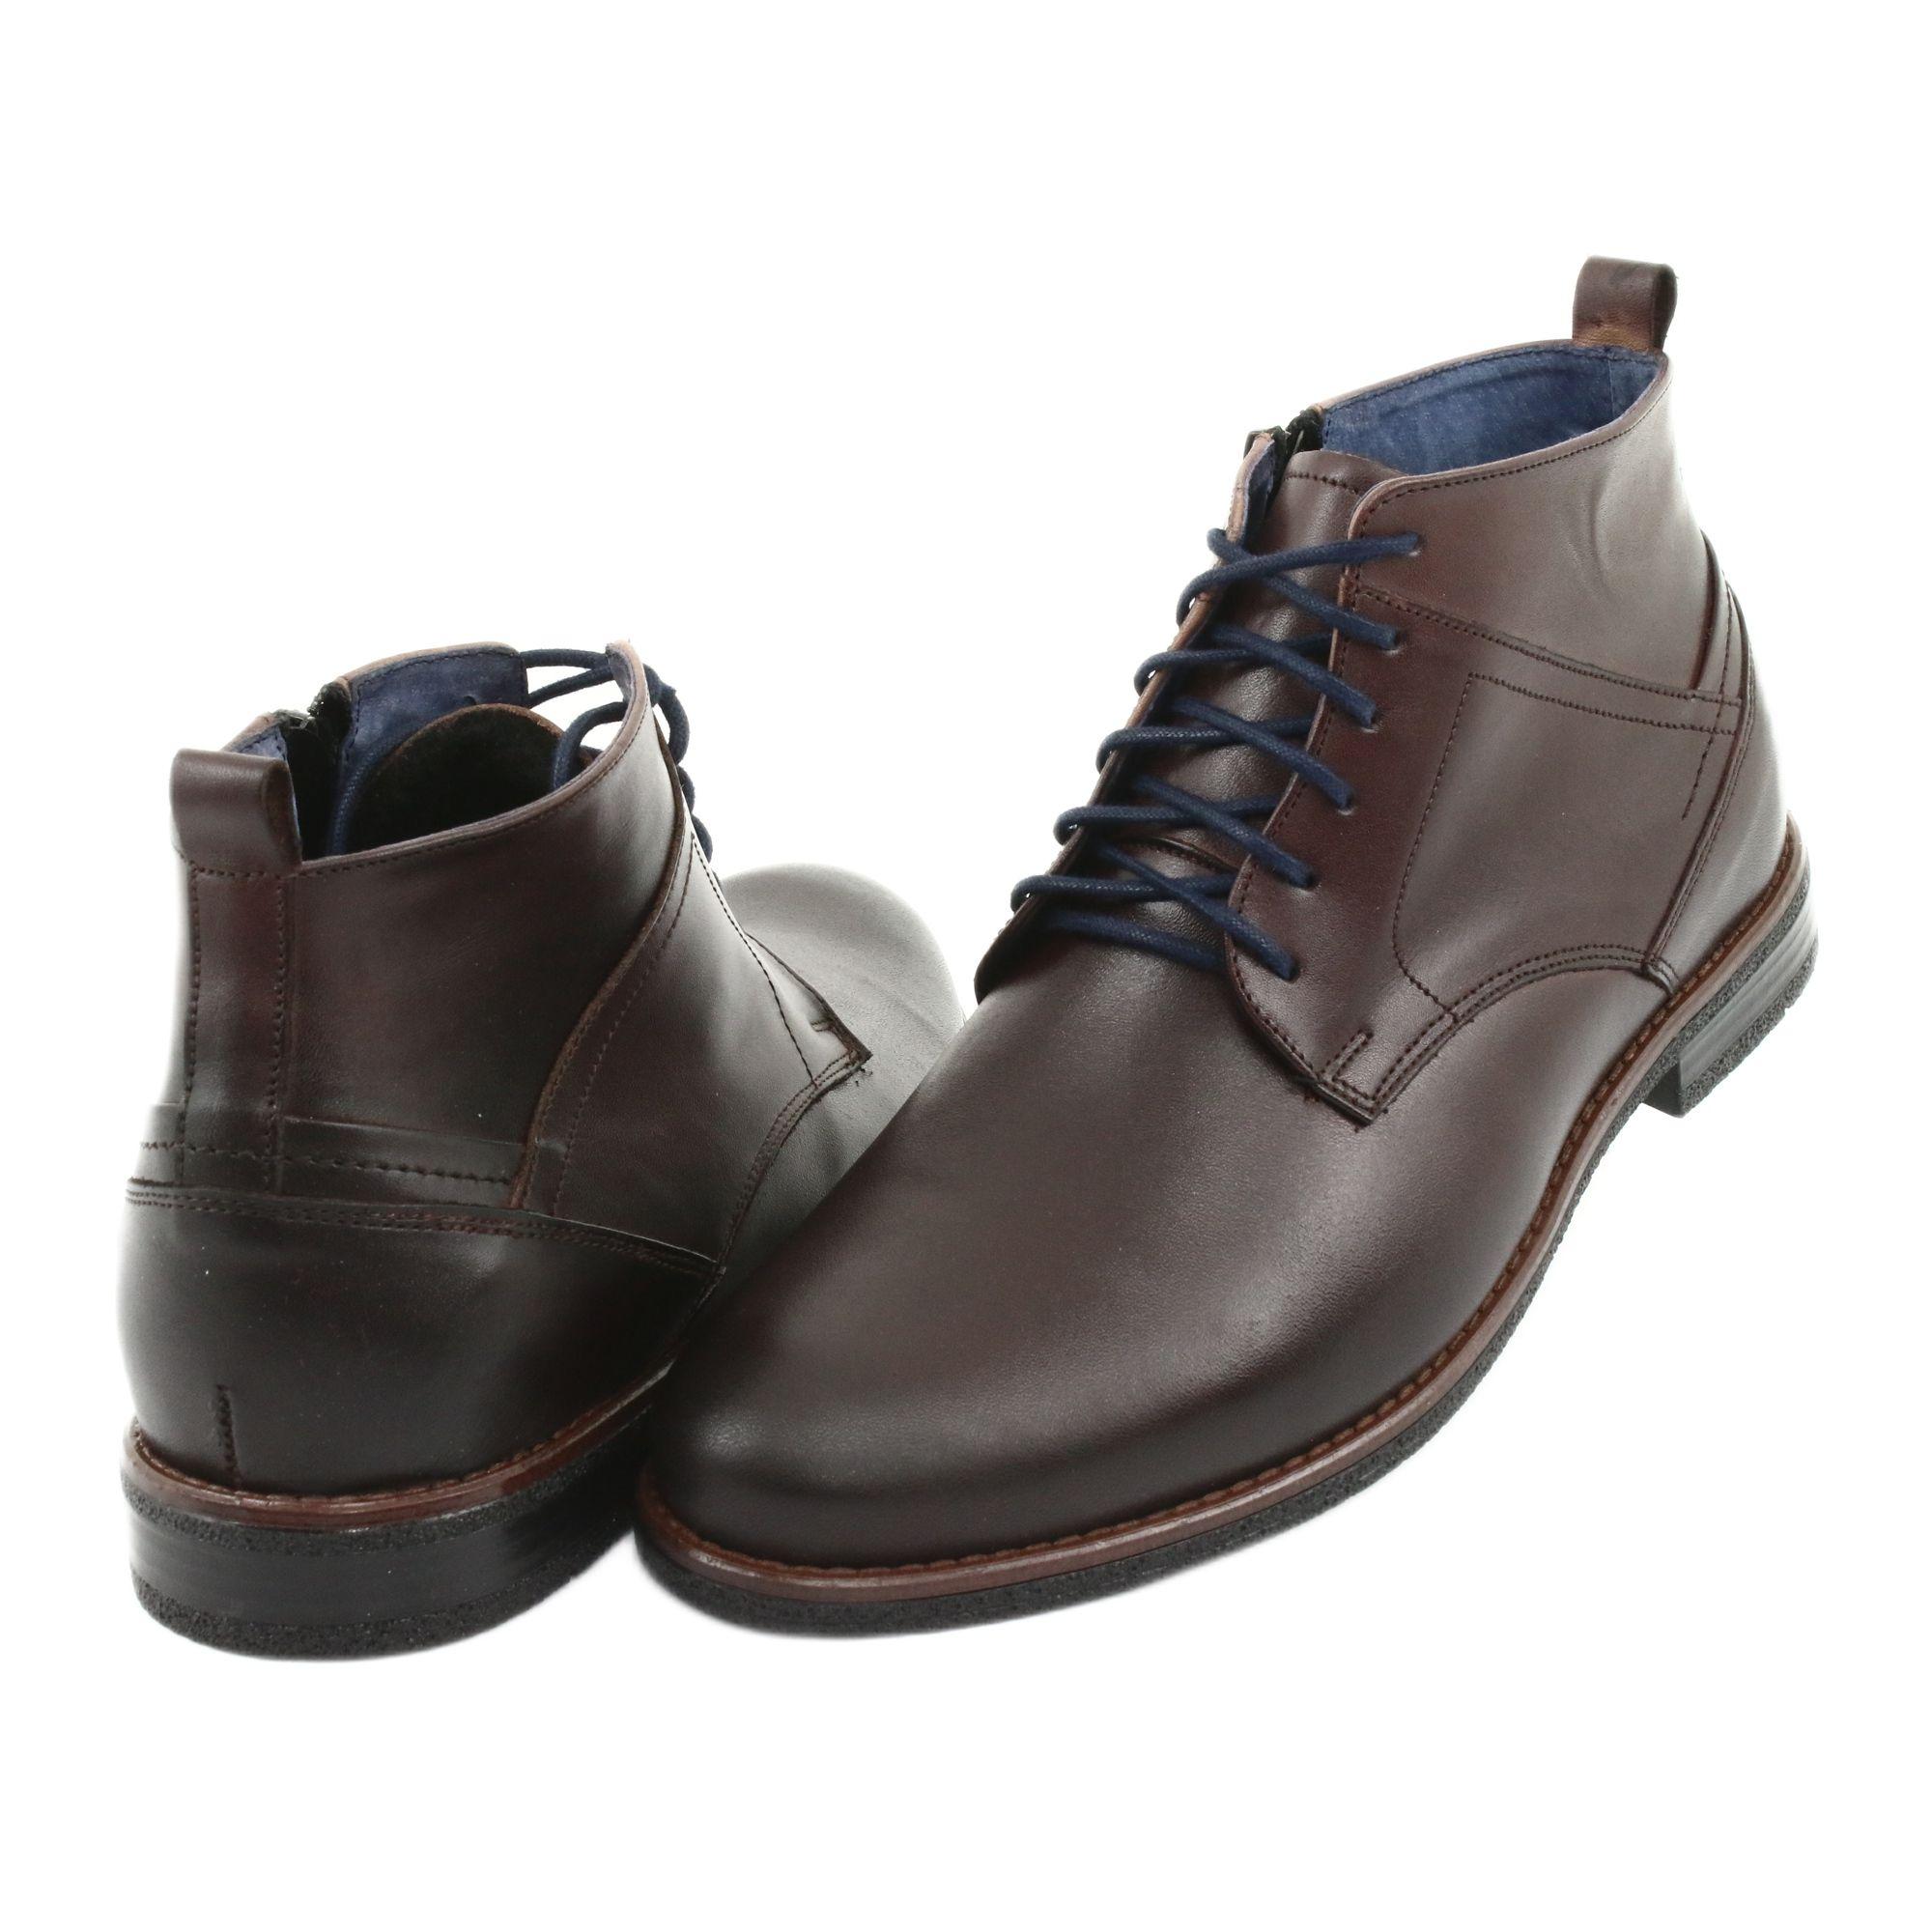 Trzewiki Skorzane Na Suwak Nikopol 702 Brazowe Mens Winter Boots Dress Shoes Men Zipper Boots